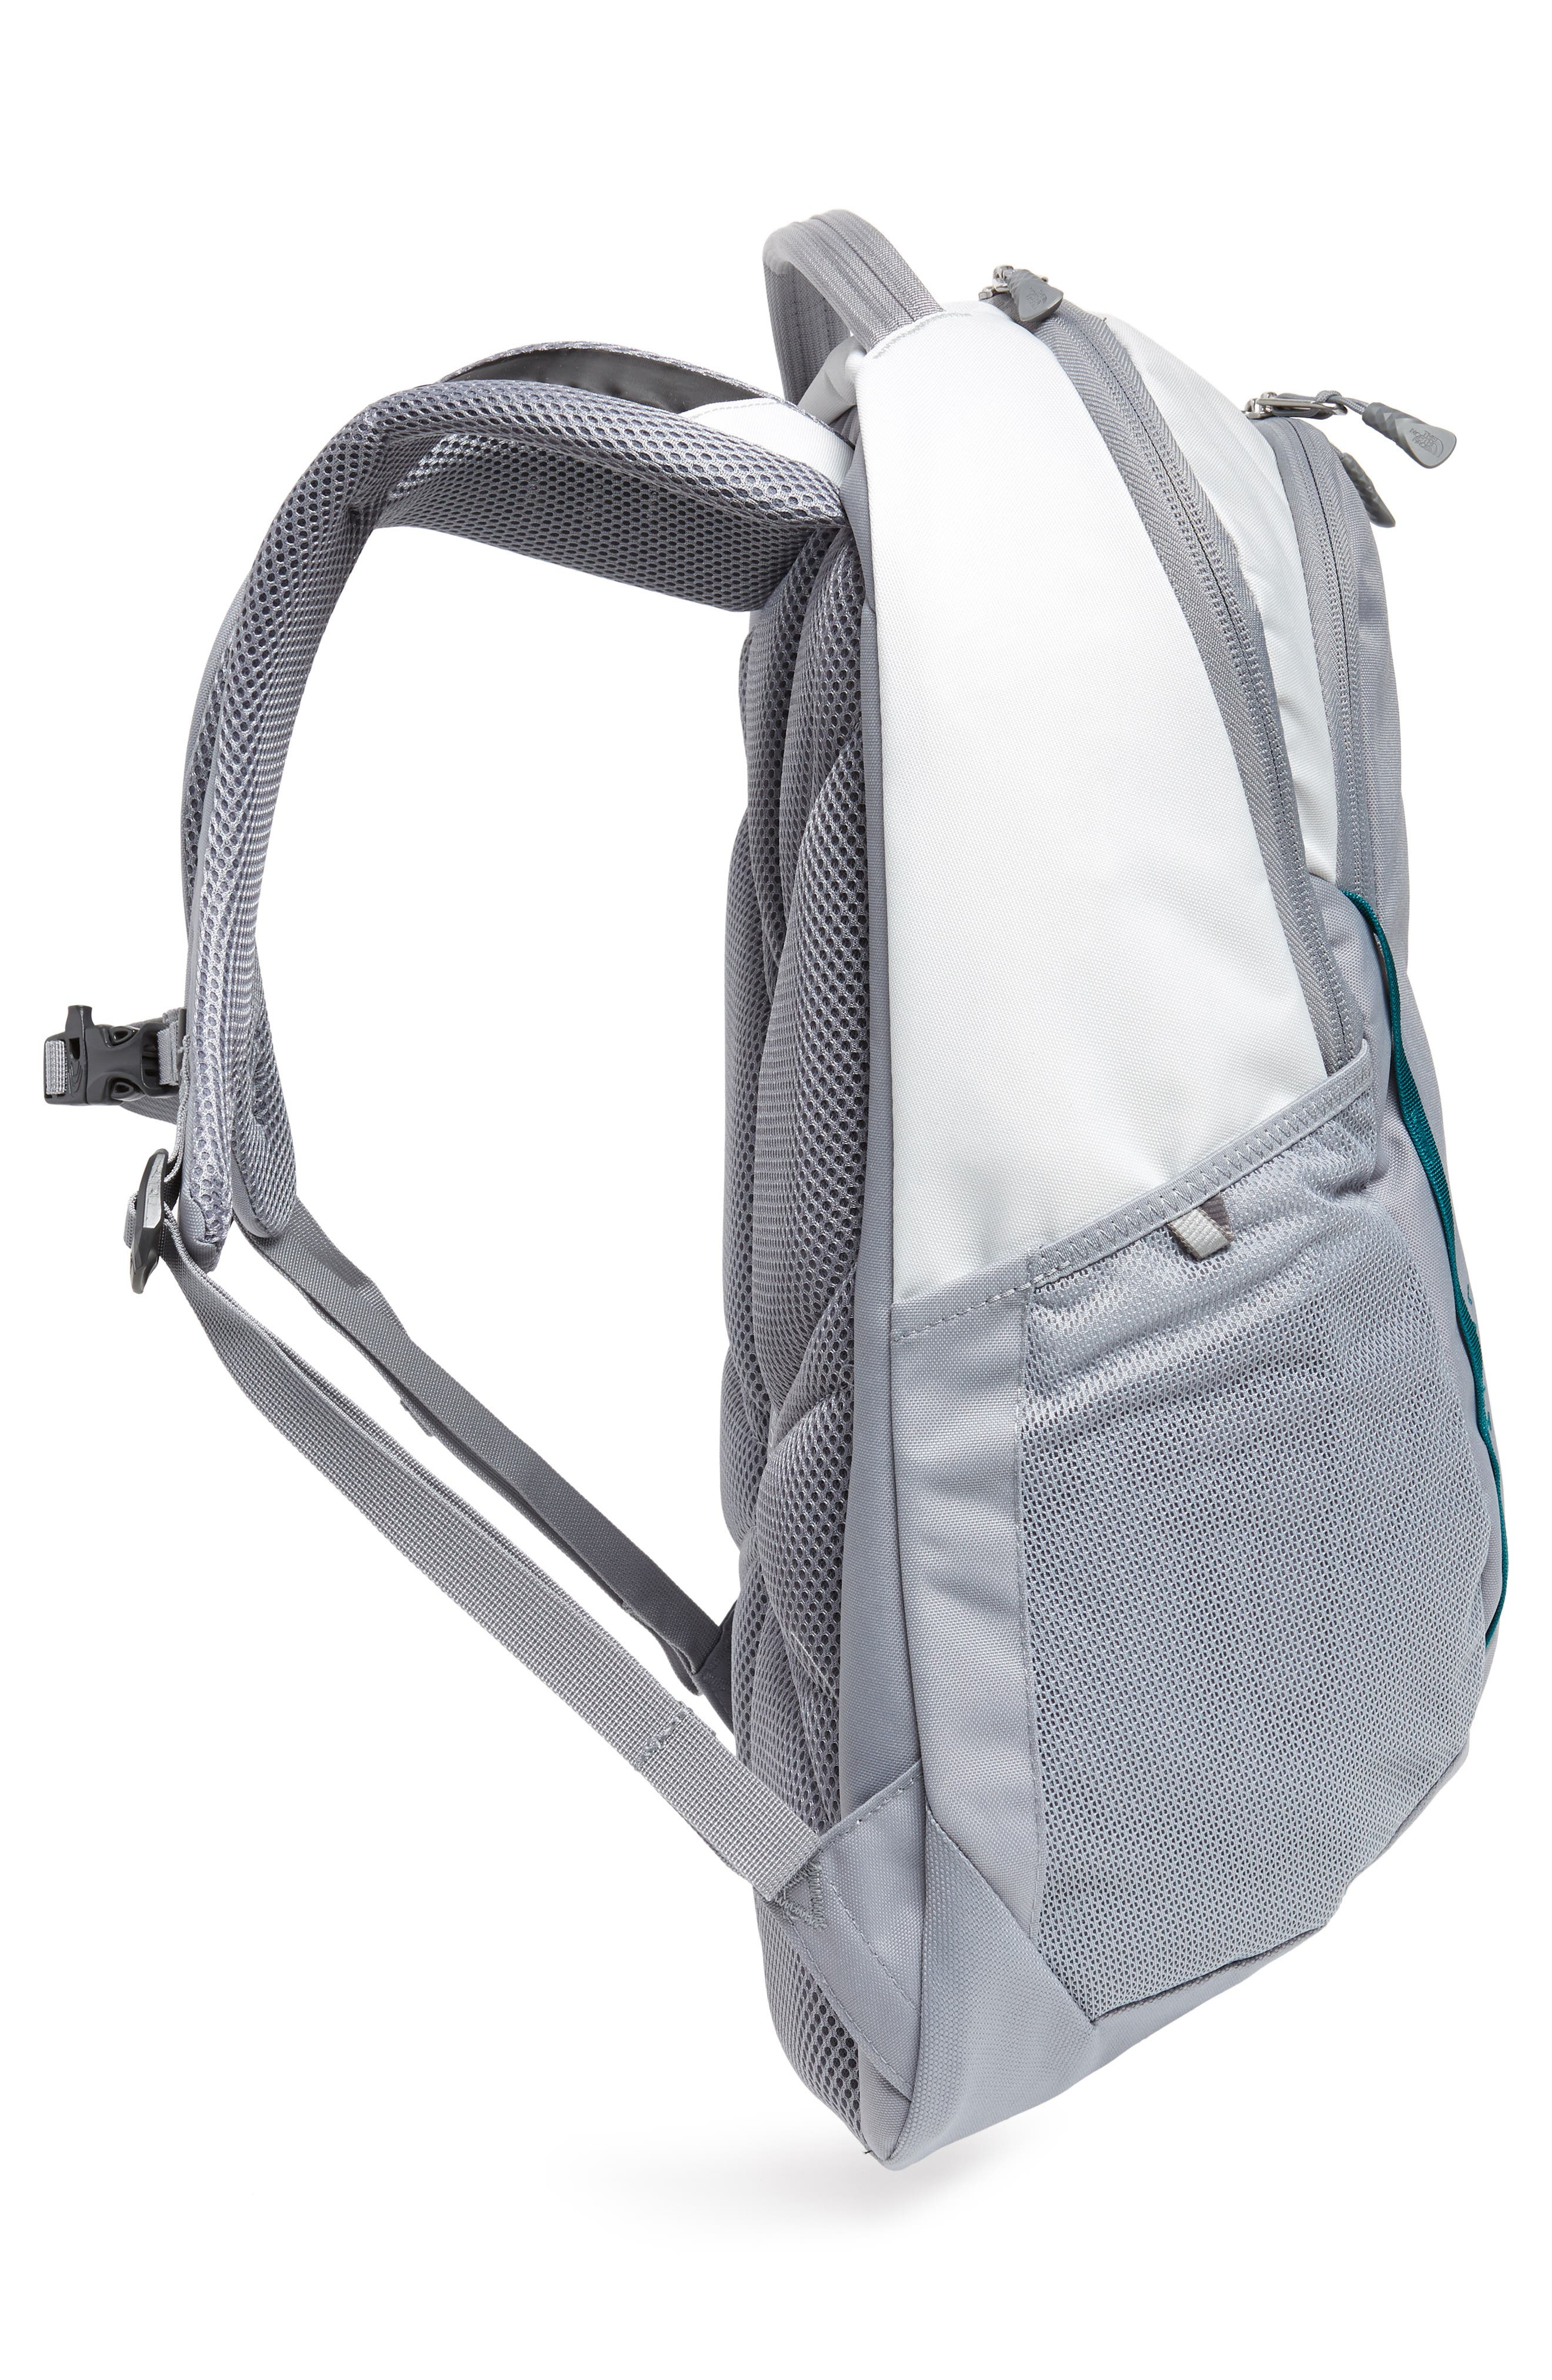 Vault Backpack,                             Alternate thumbnail 3, color,                             Tin Grey/ Mid Grey